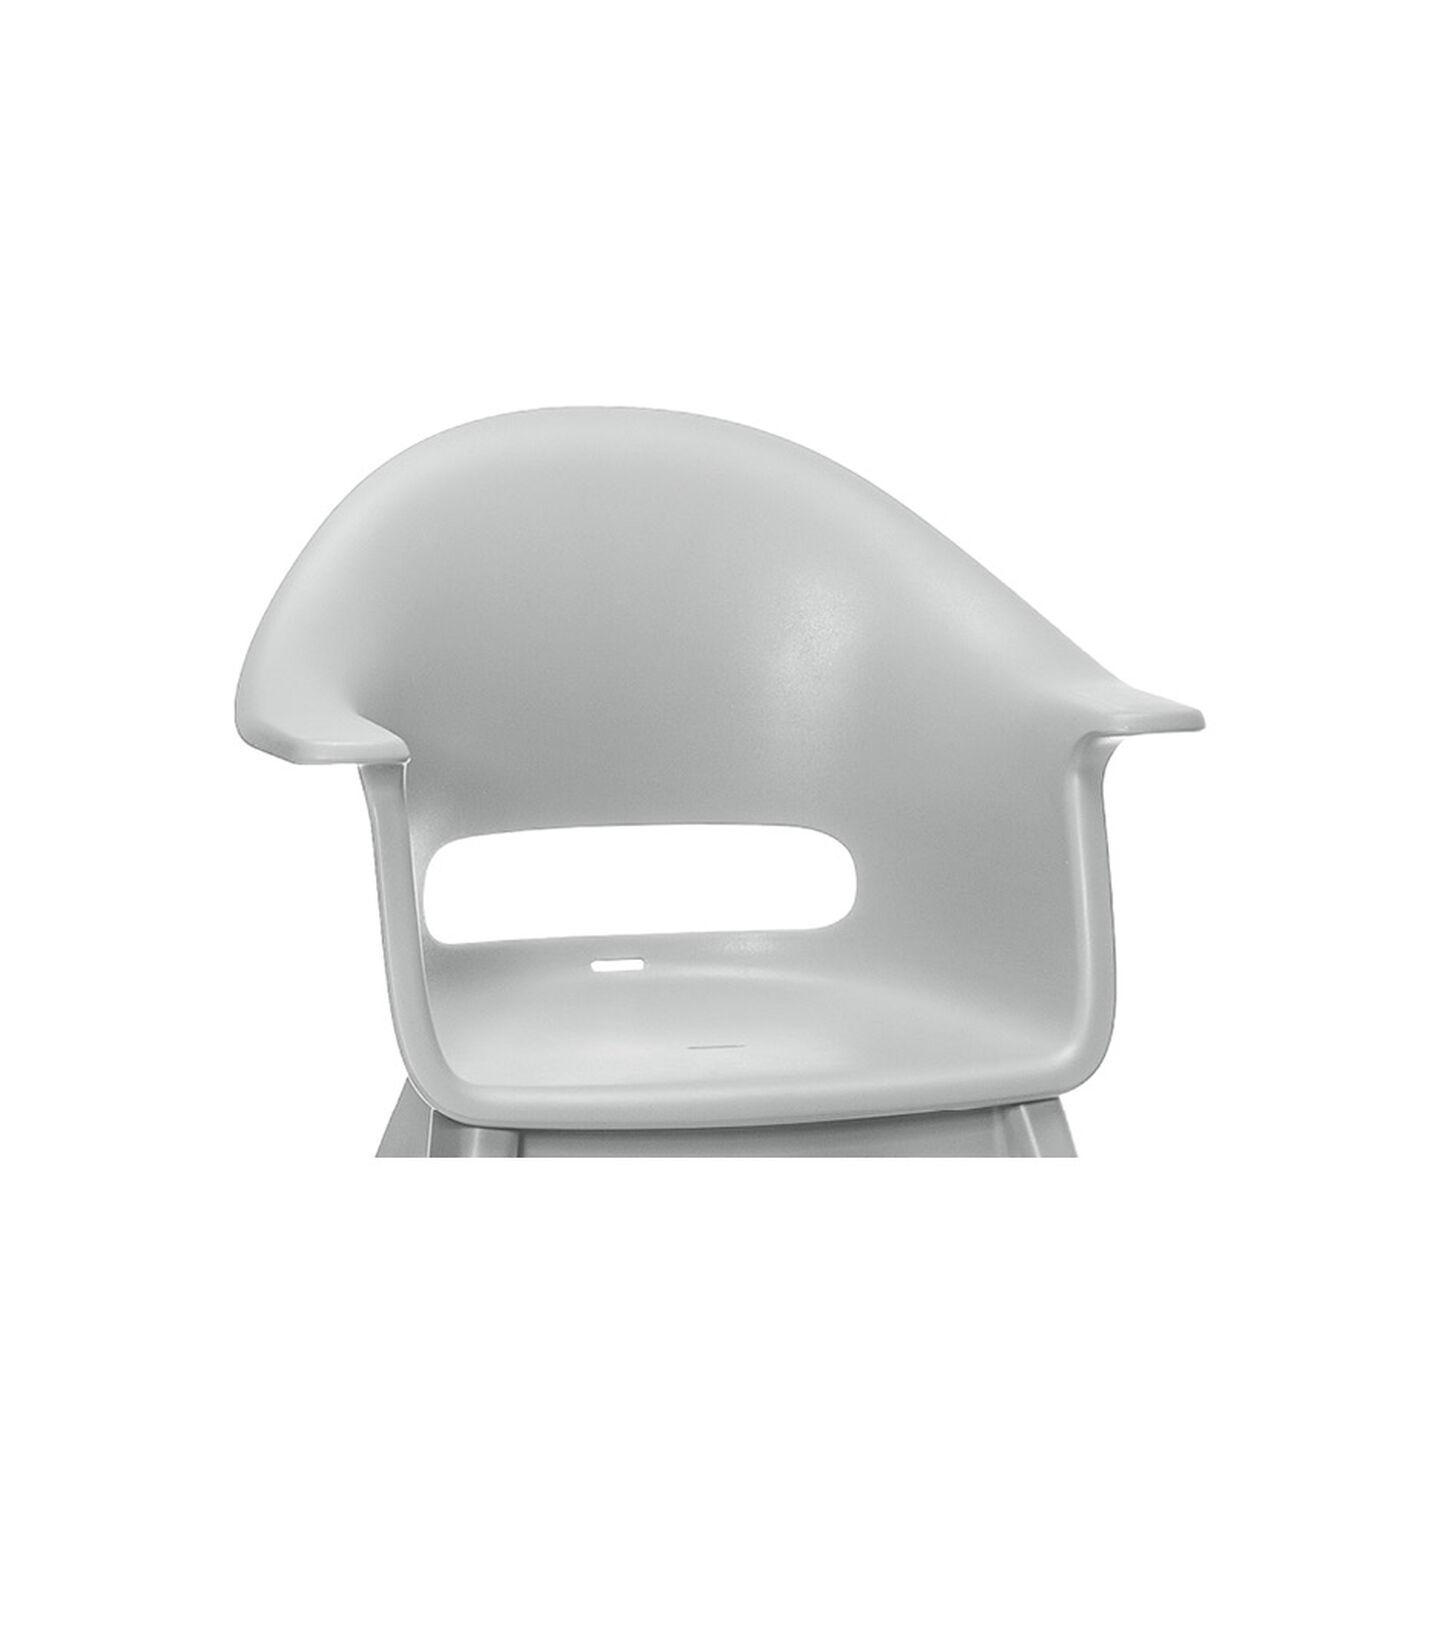 Stokke® Clikk™ Seat Cloud Grey, Cloud Grey, mainview view 2